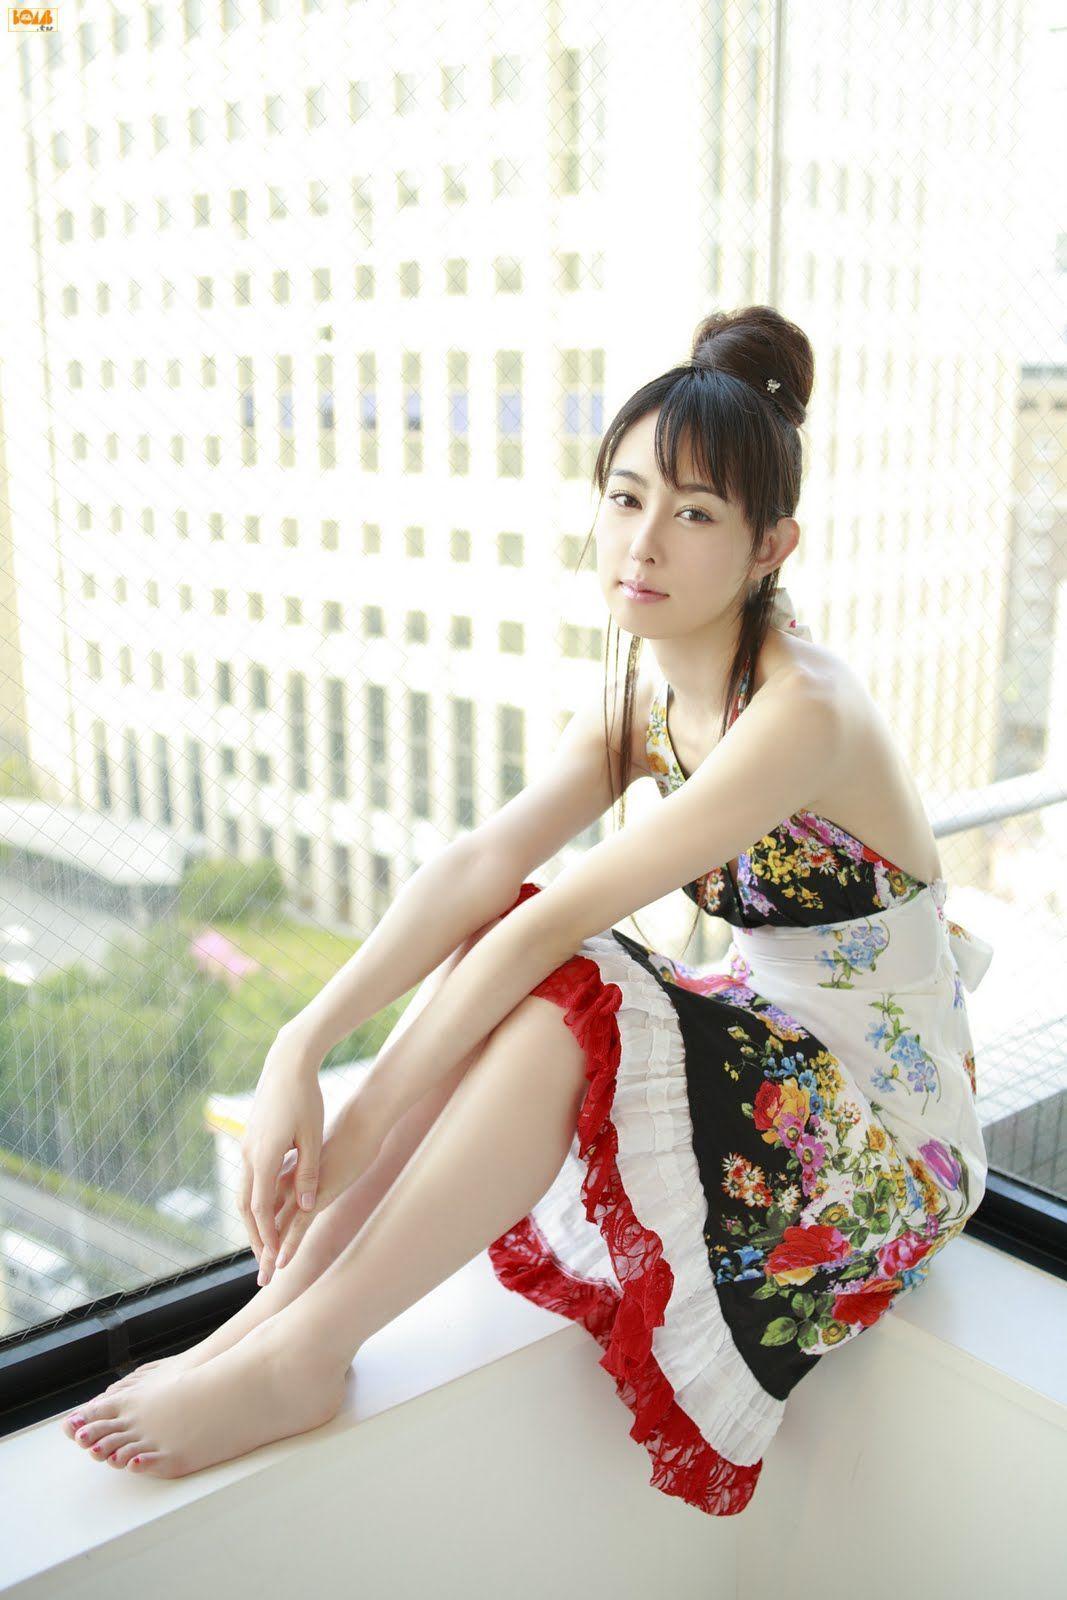 Cute Girl Wallpaper Hd Download Cute Asian Girls Wallpapers Group 65